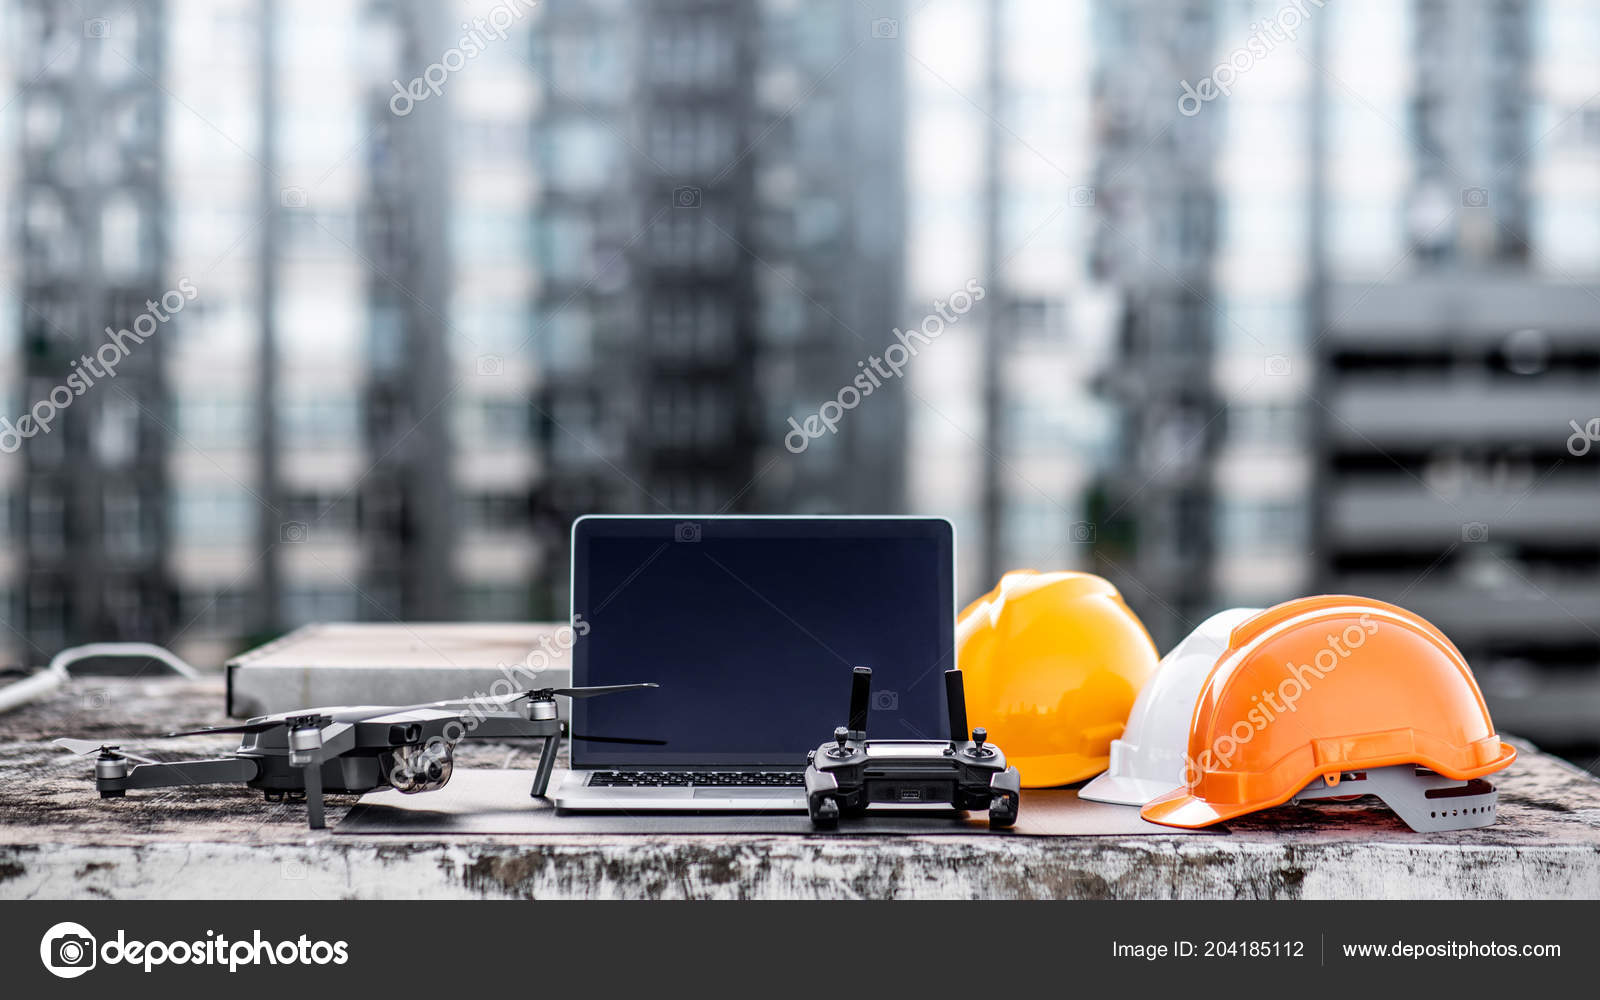 Drone Remote Control Laptop Computer Protective Helmet